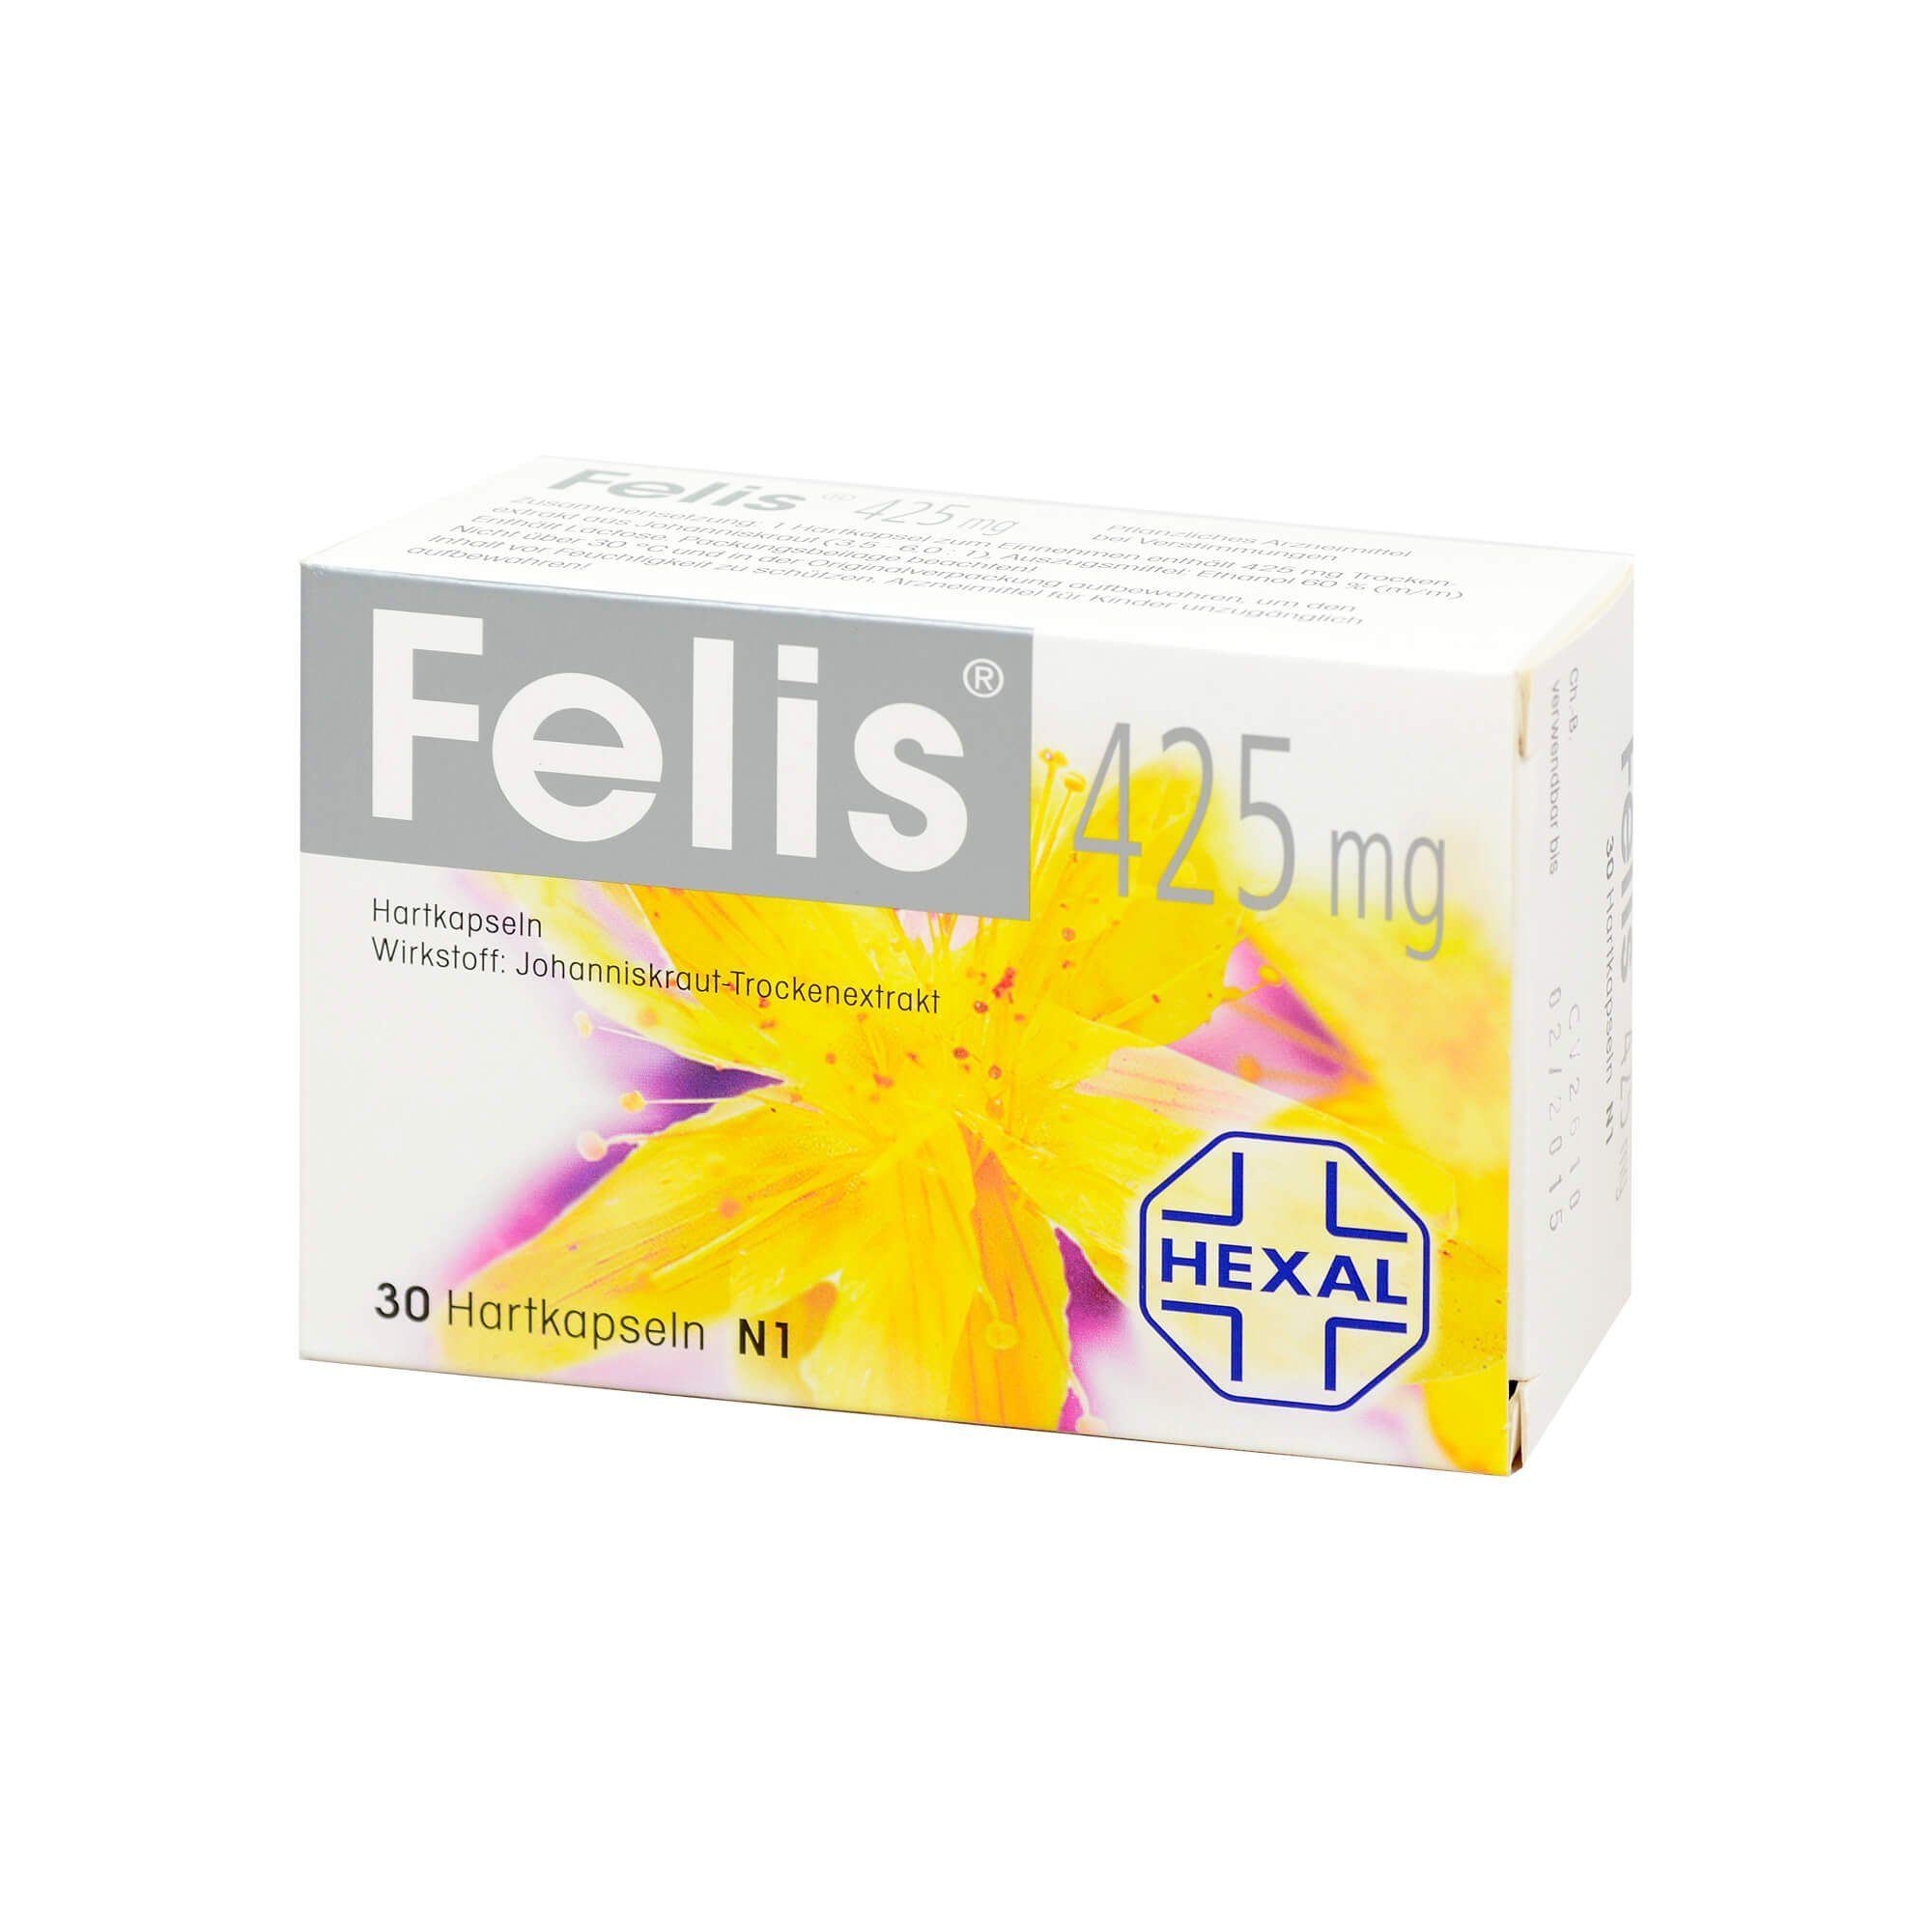 FELIS 425, 30 St